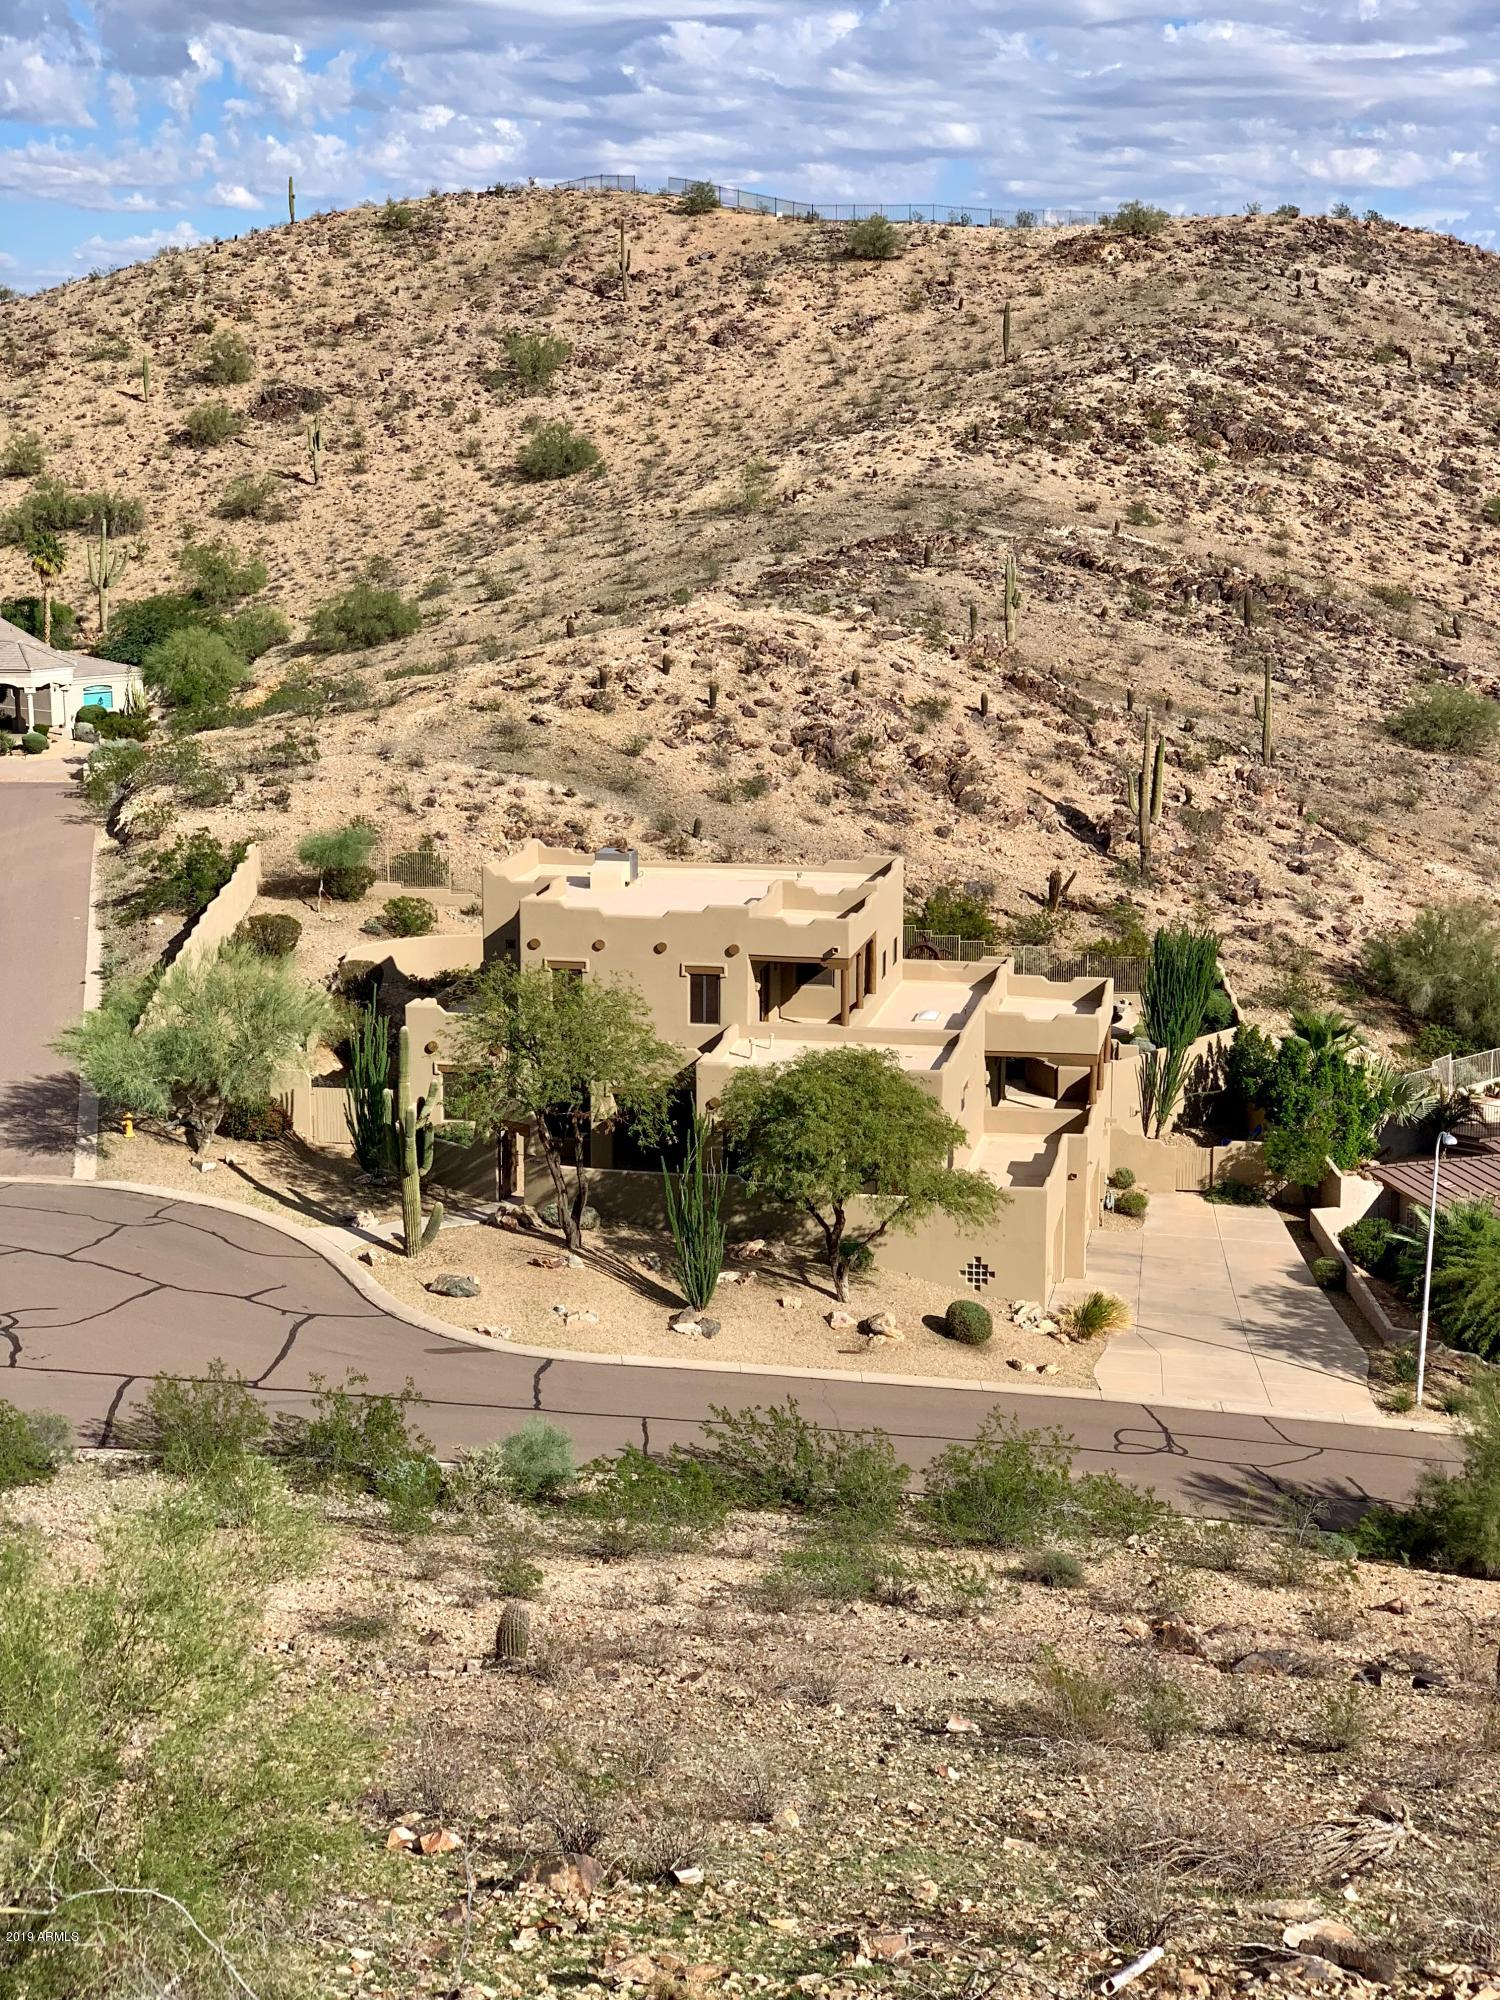 MLS 5923472 2466 E GLENHAVEN Drive, Phoenix, AZ 85048 Ahwatukee The Foothills AZ